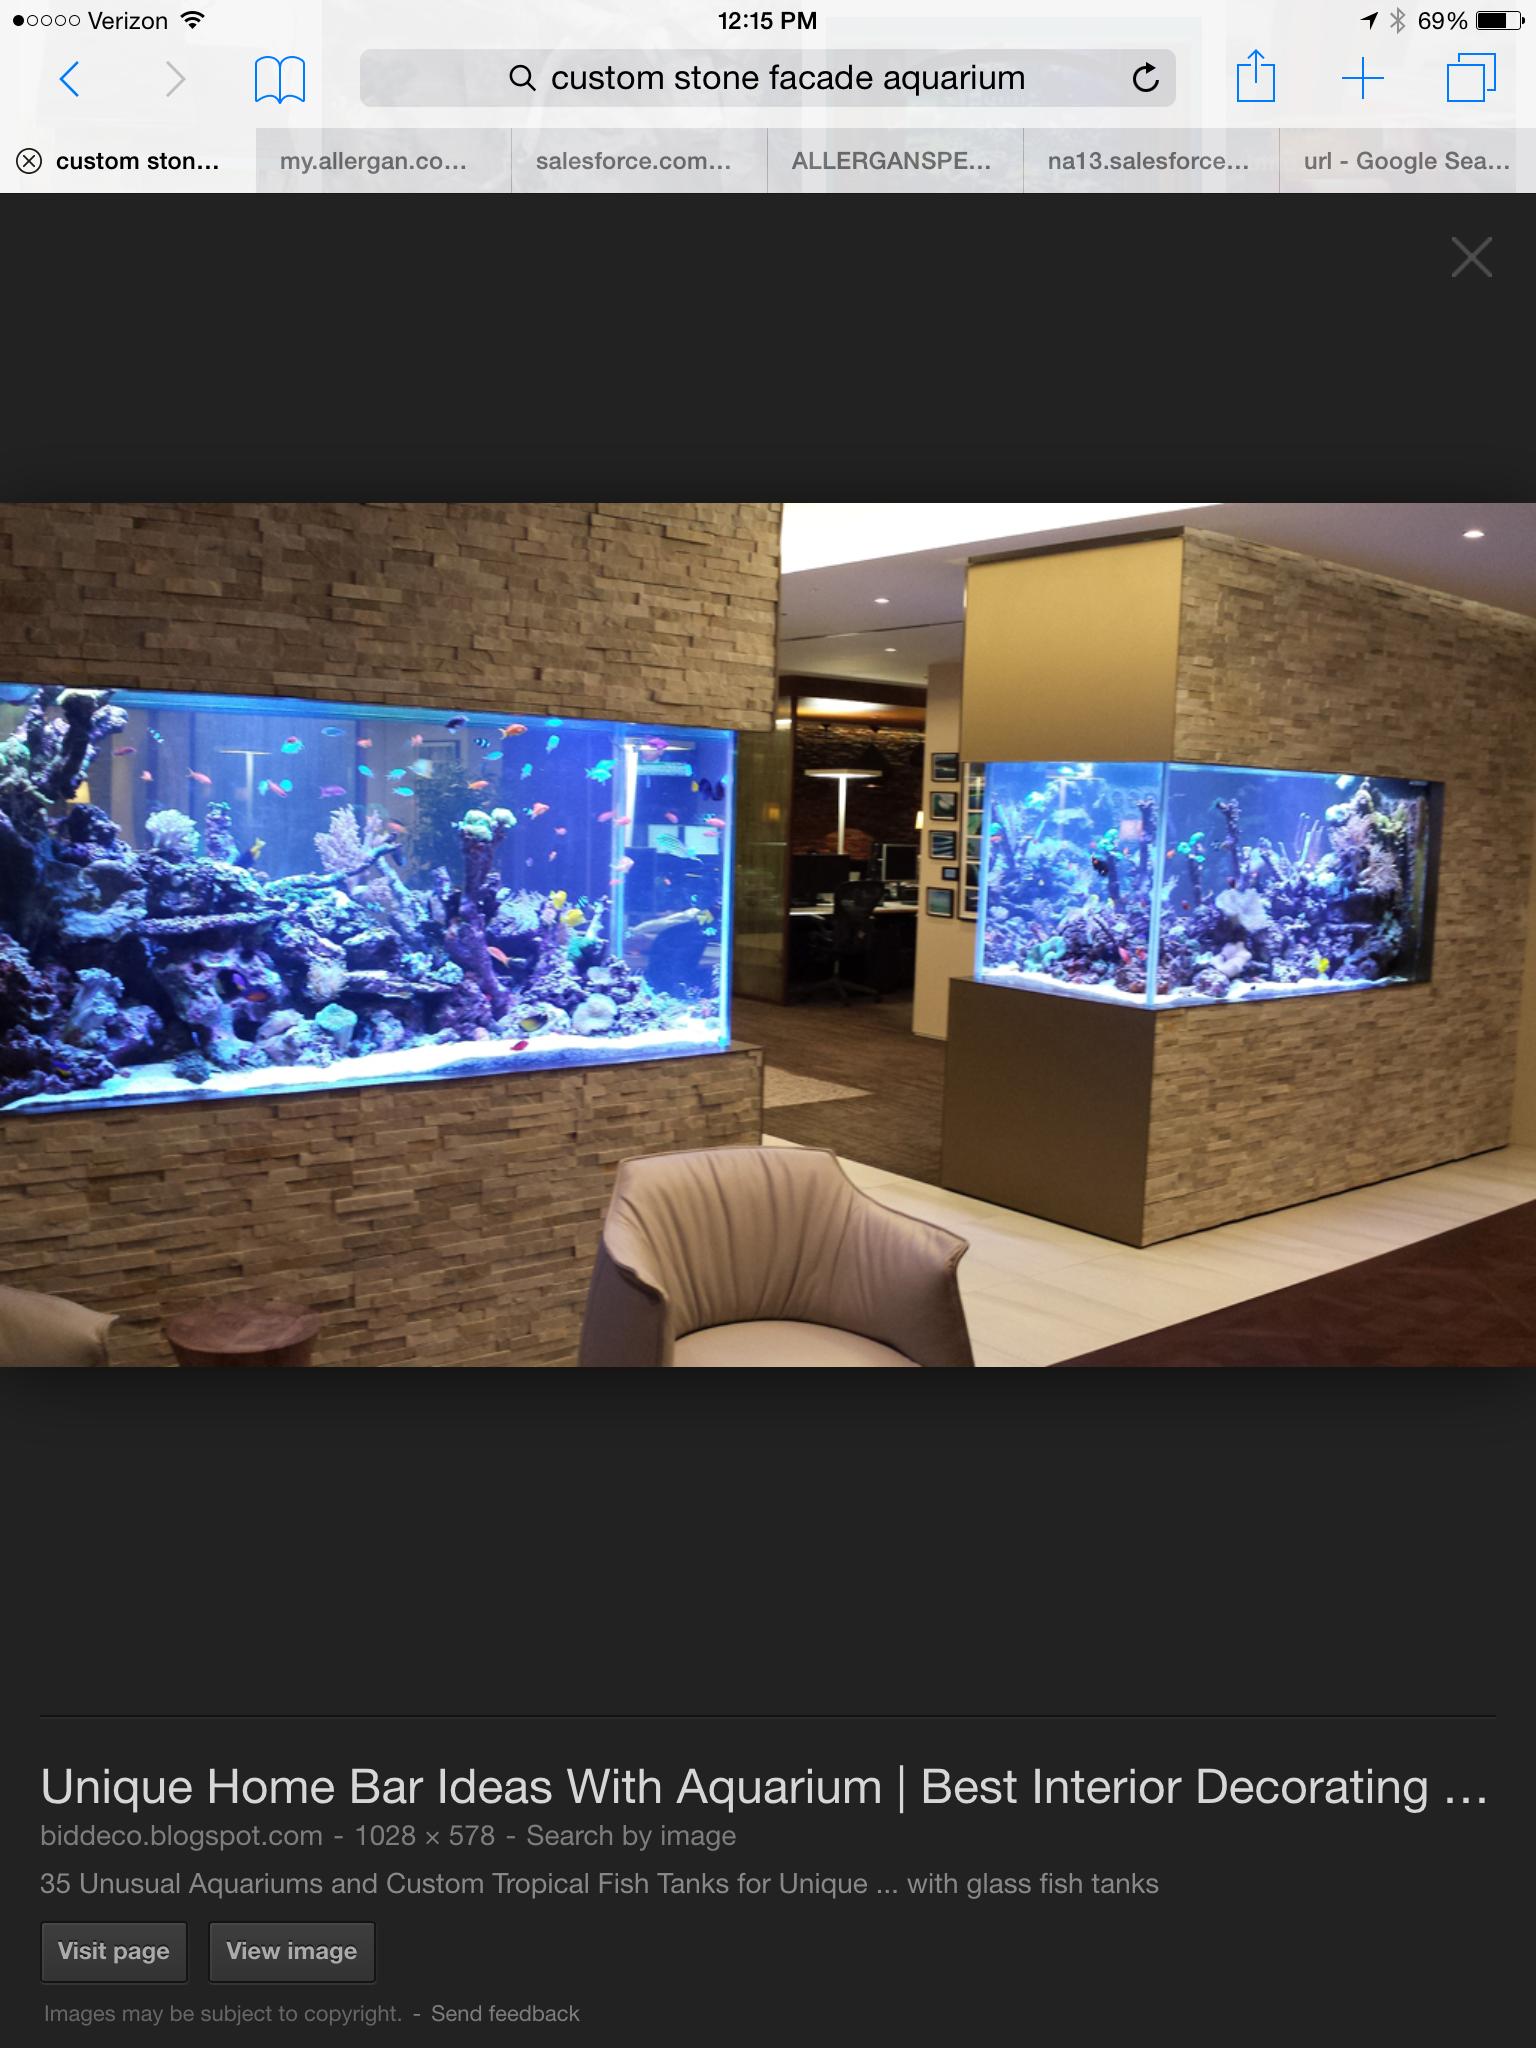 Home Aquarium Ideas The Aquarium Buyers Guide 30 Incredibly Awesome